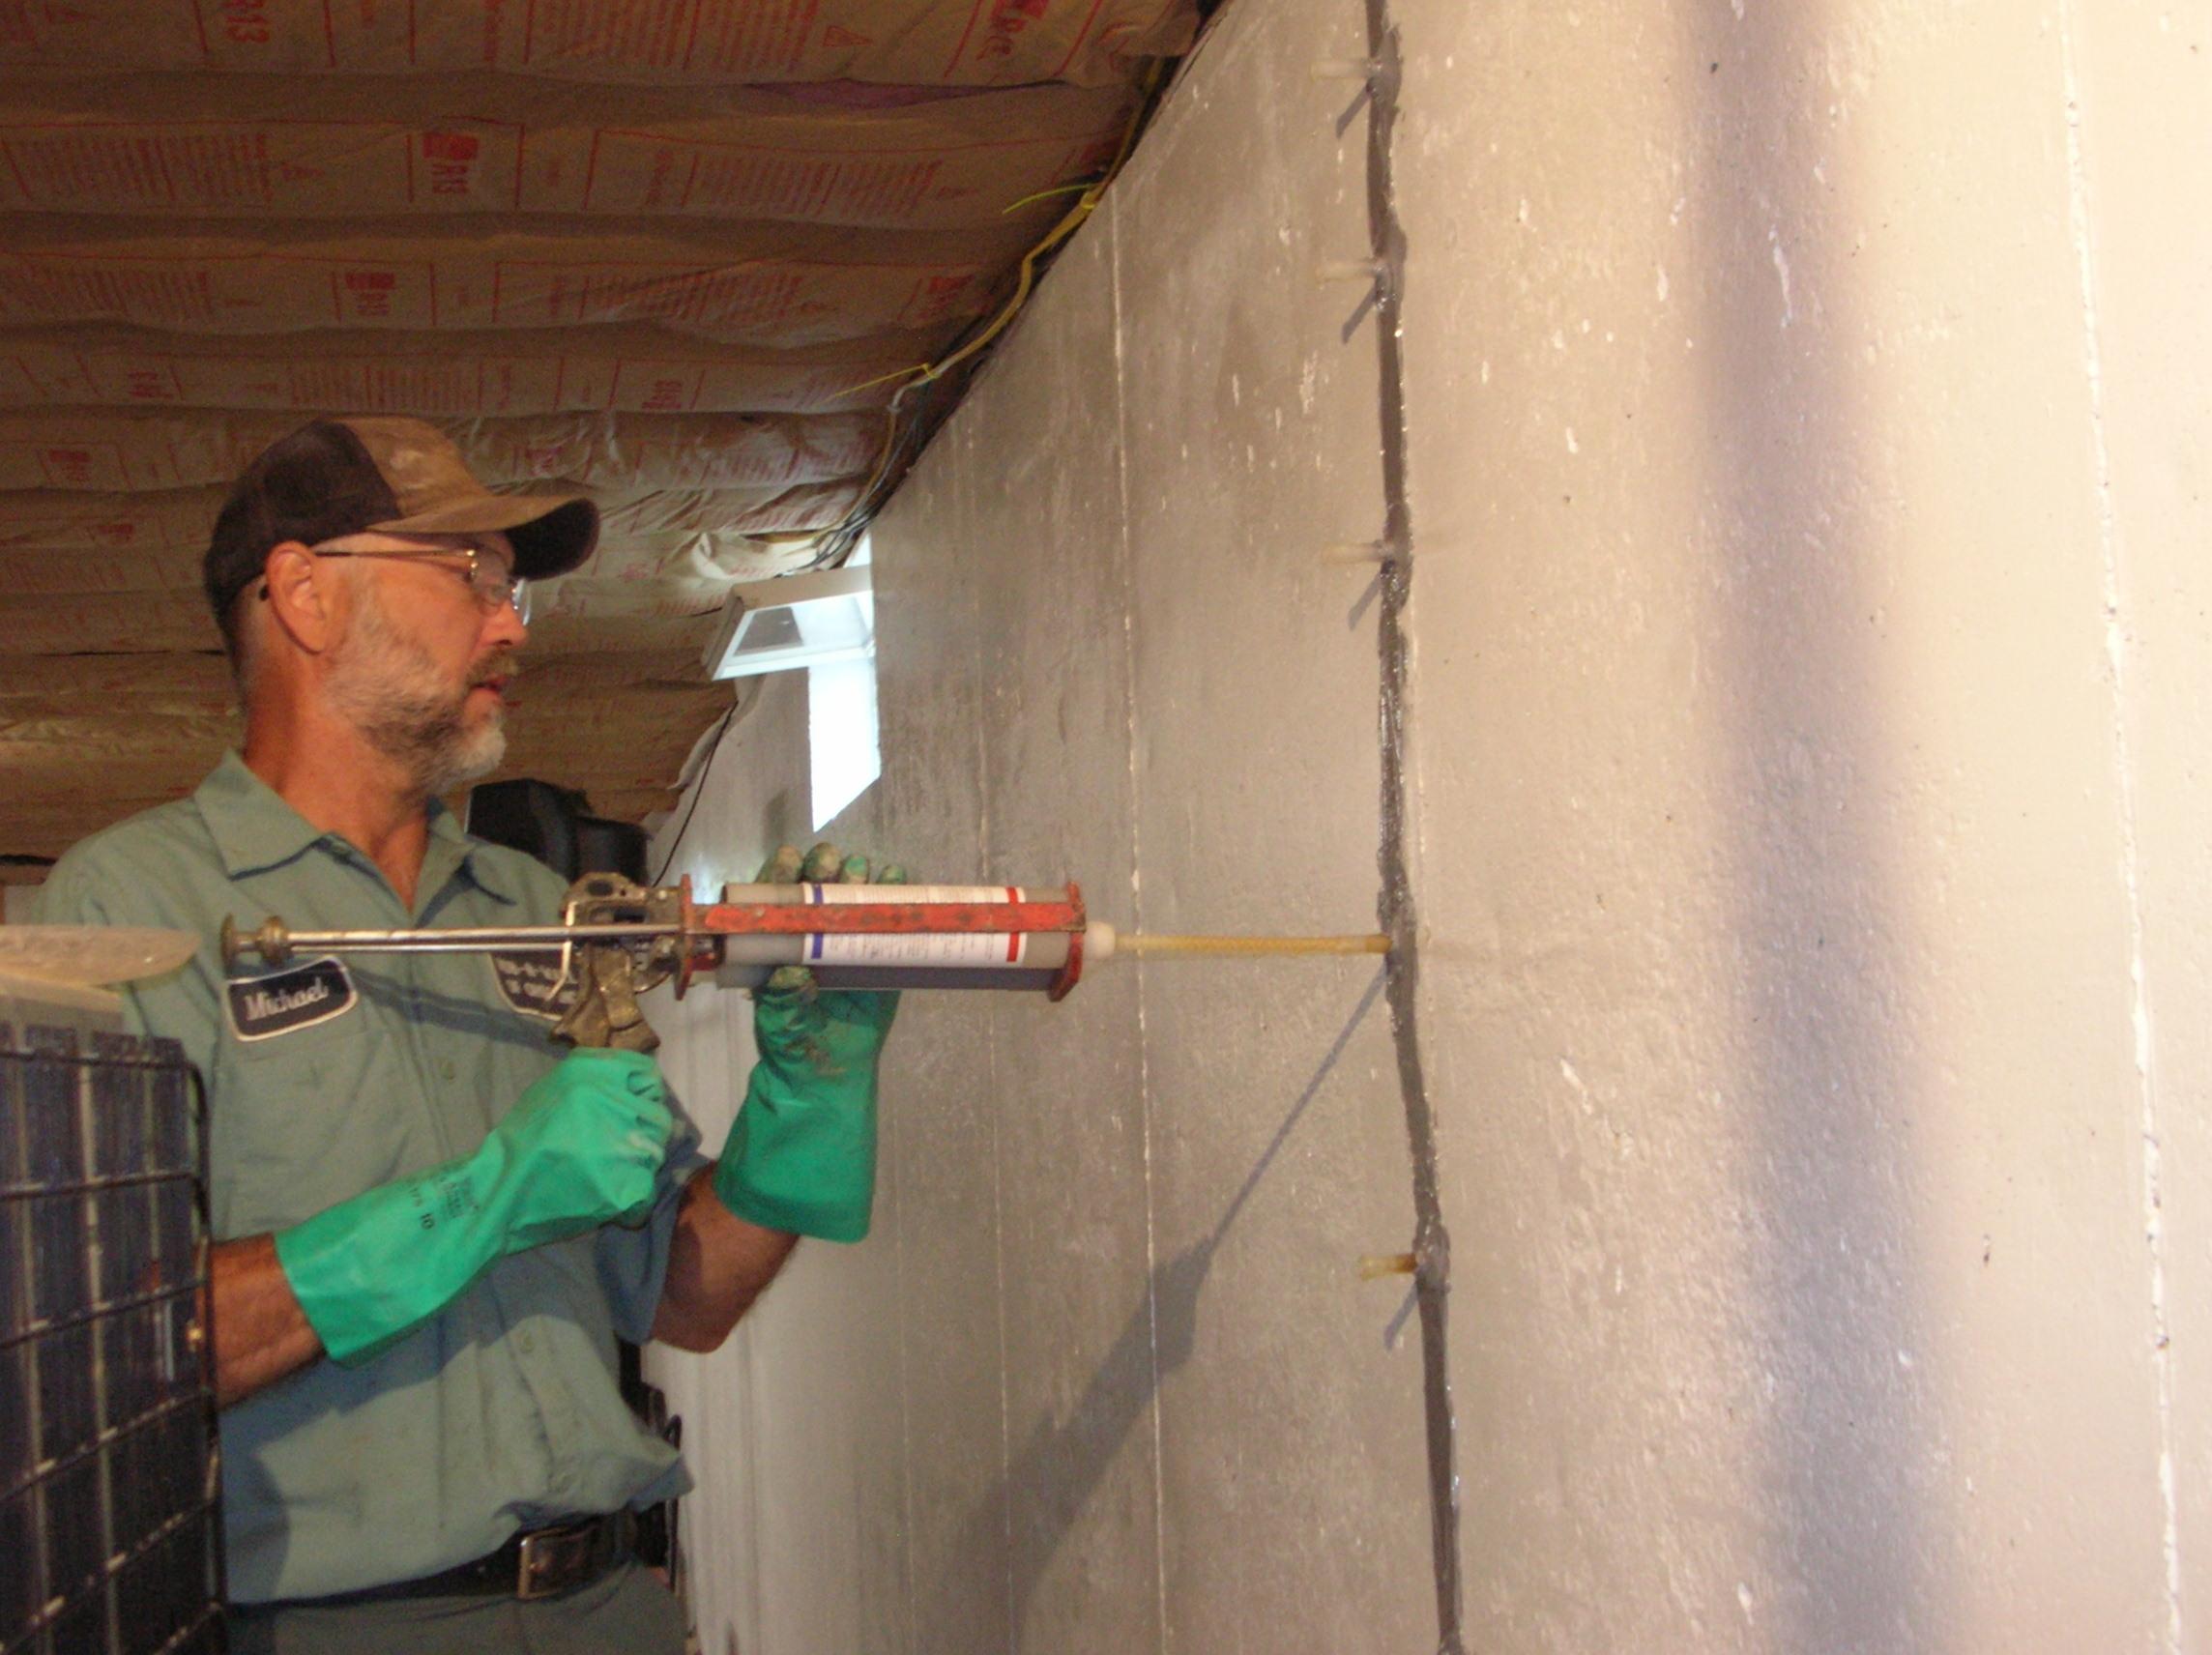 Sealing Basement Cracks Walls